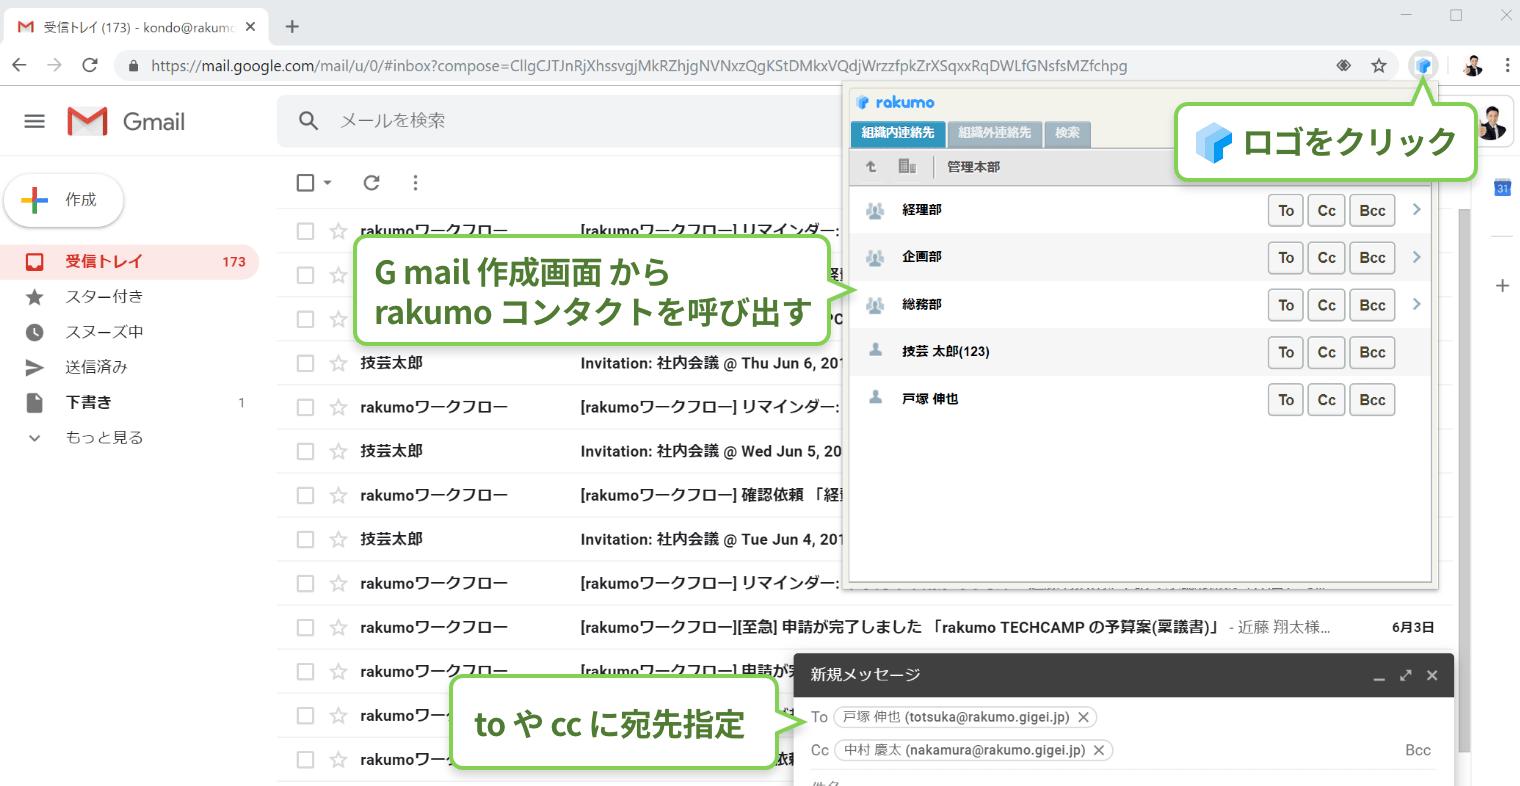 rakumo コンタクト 「rakumo エクステンション for Gmail」利用画面